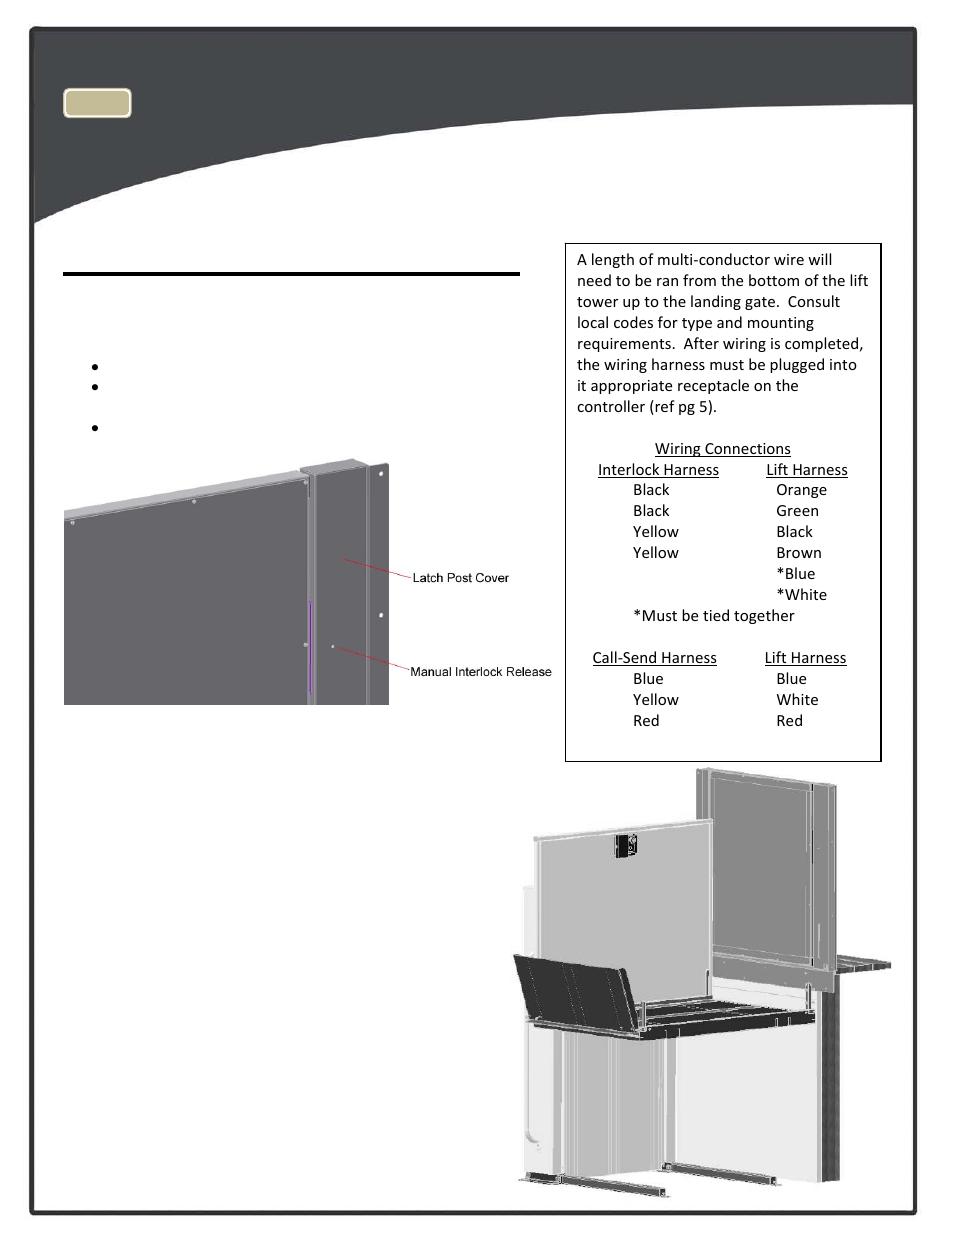 medium resolution of top landing gate optional harmar mobility highlander cpl1200 user manual page 13 22